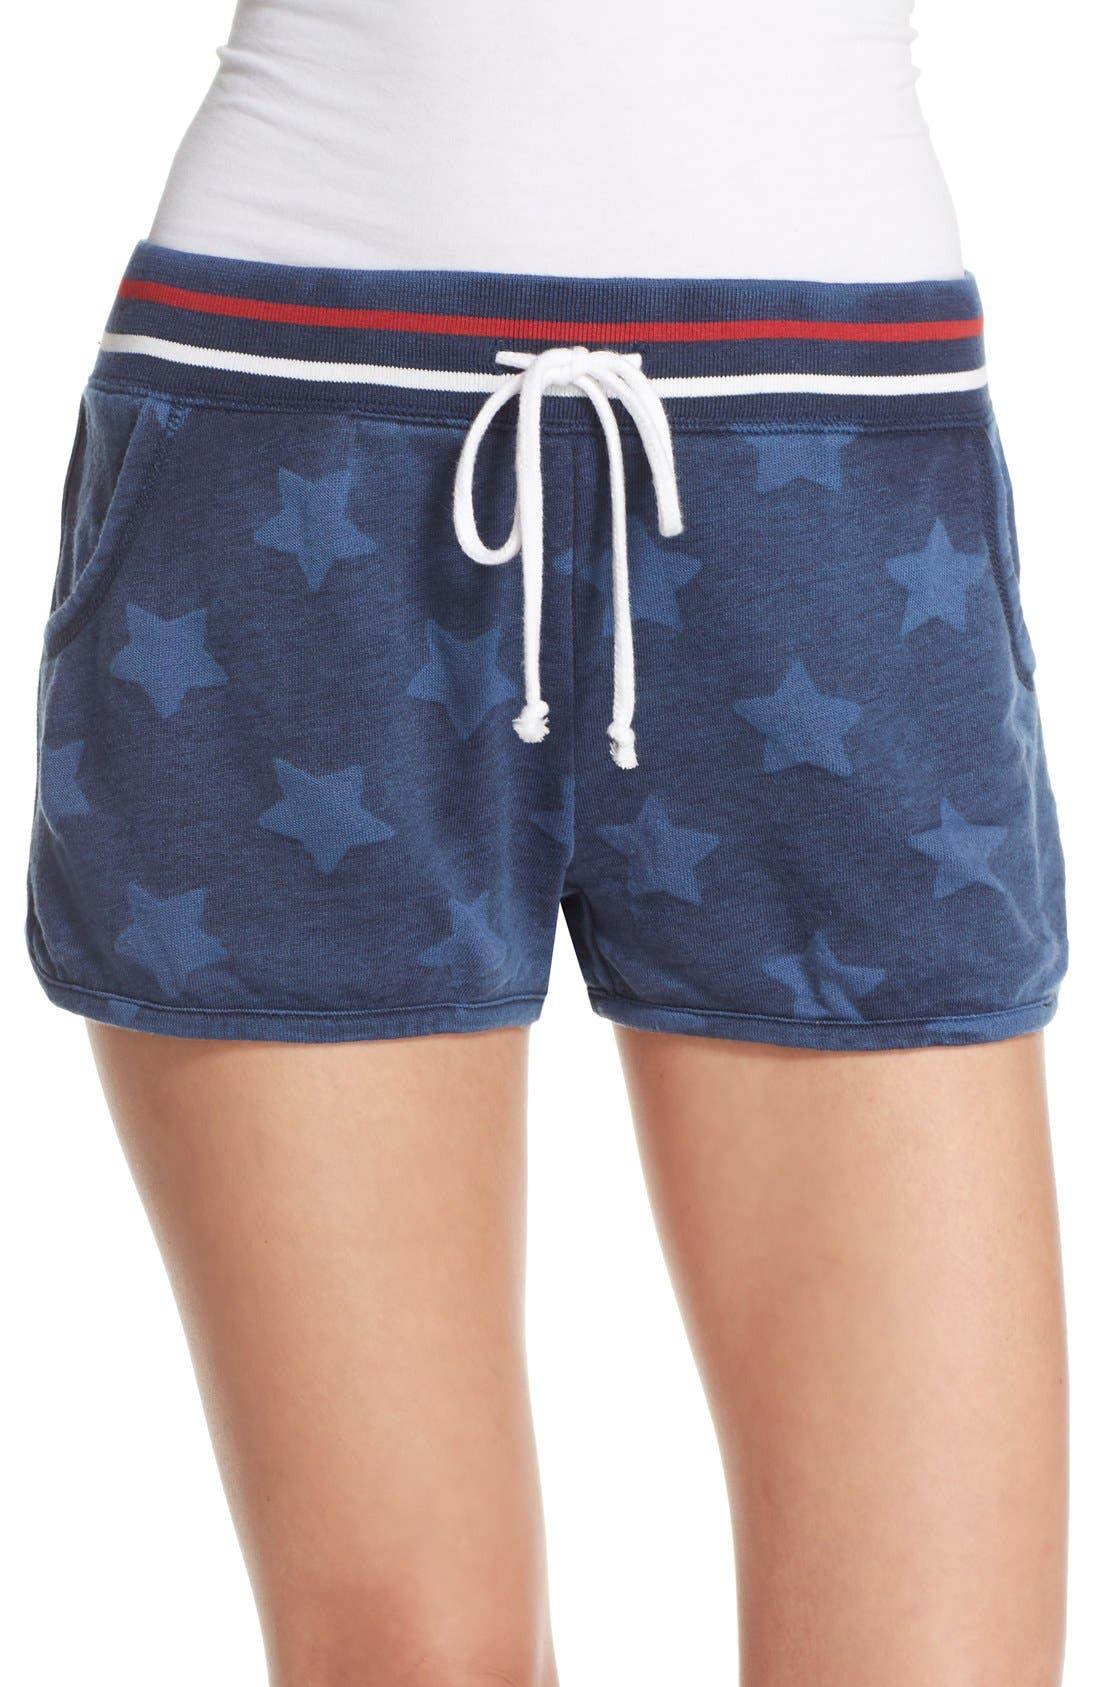 Alternate Image 1 Selected - PJ Salvage 'Road Trip' Star Print Pajama Shorts